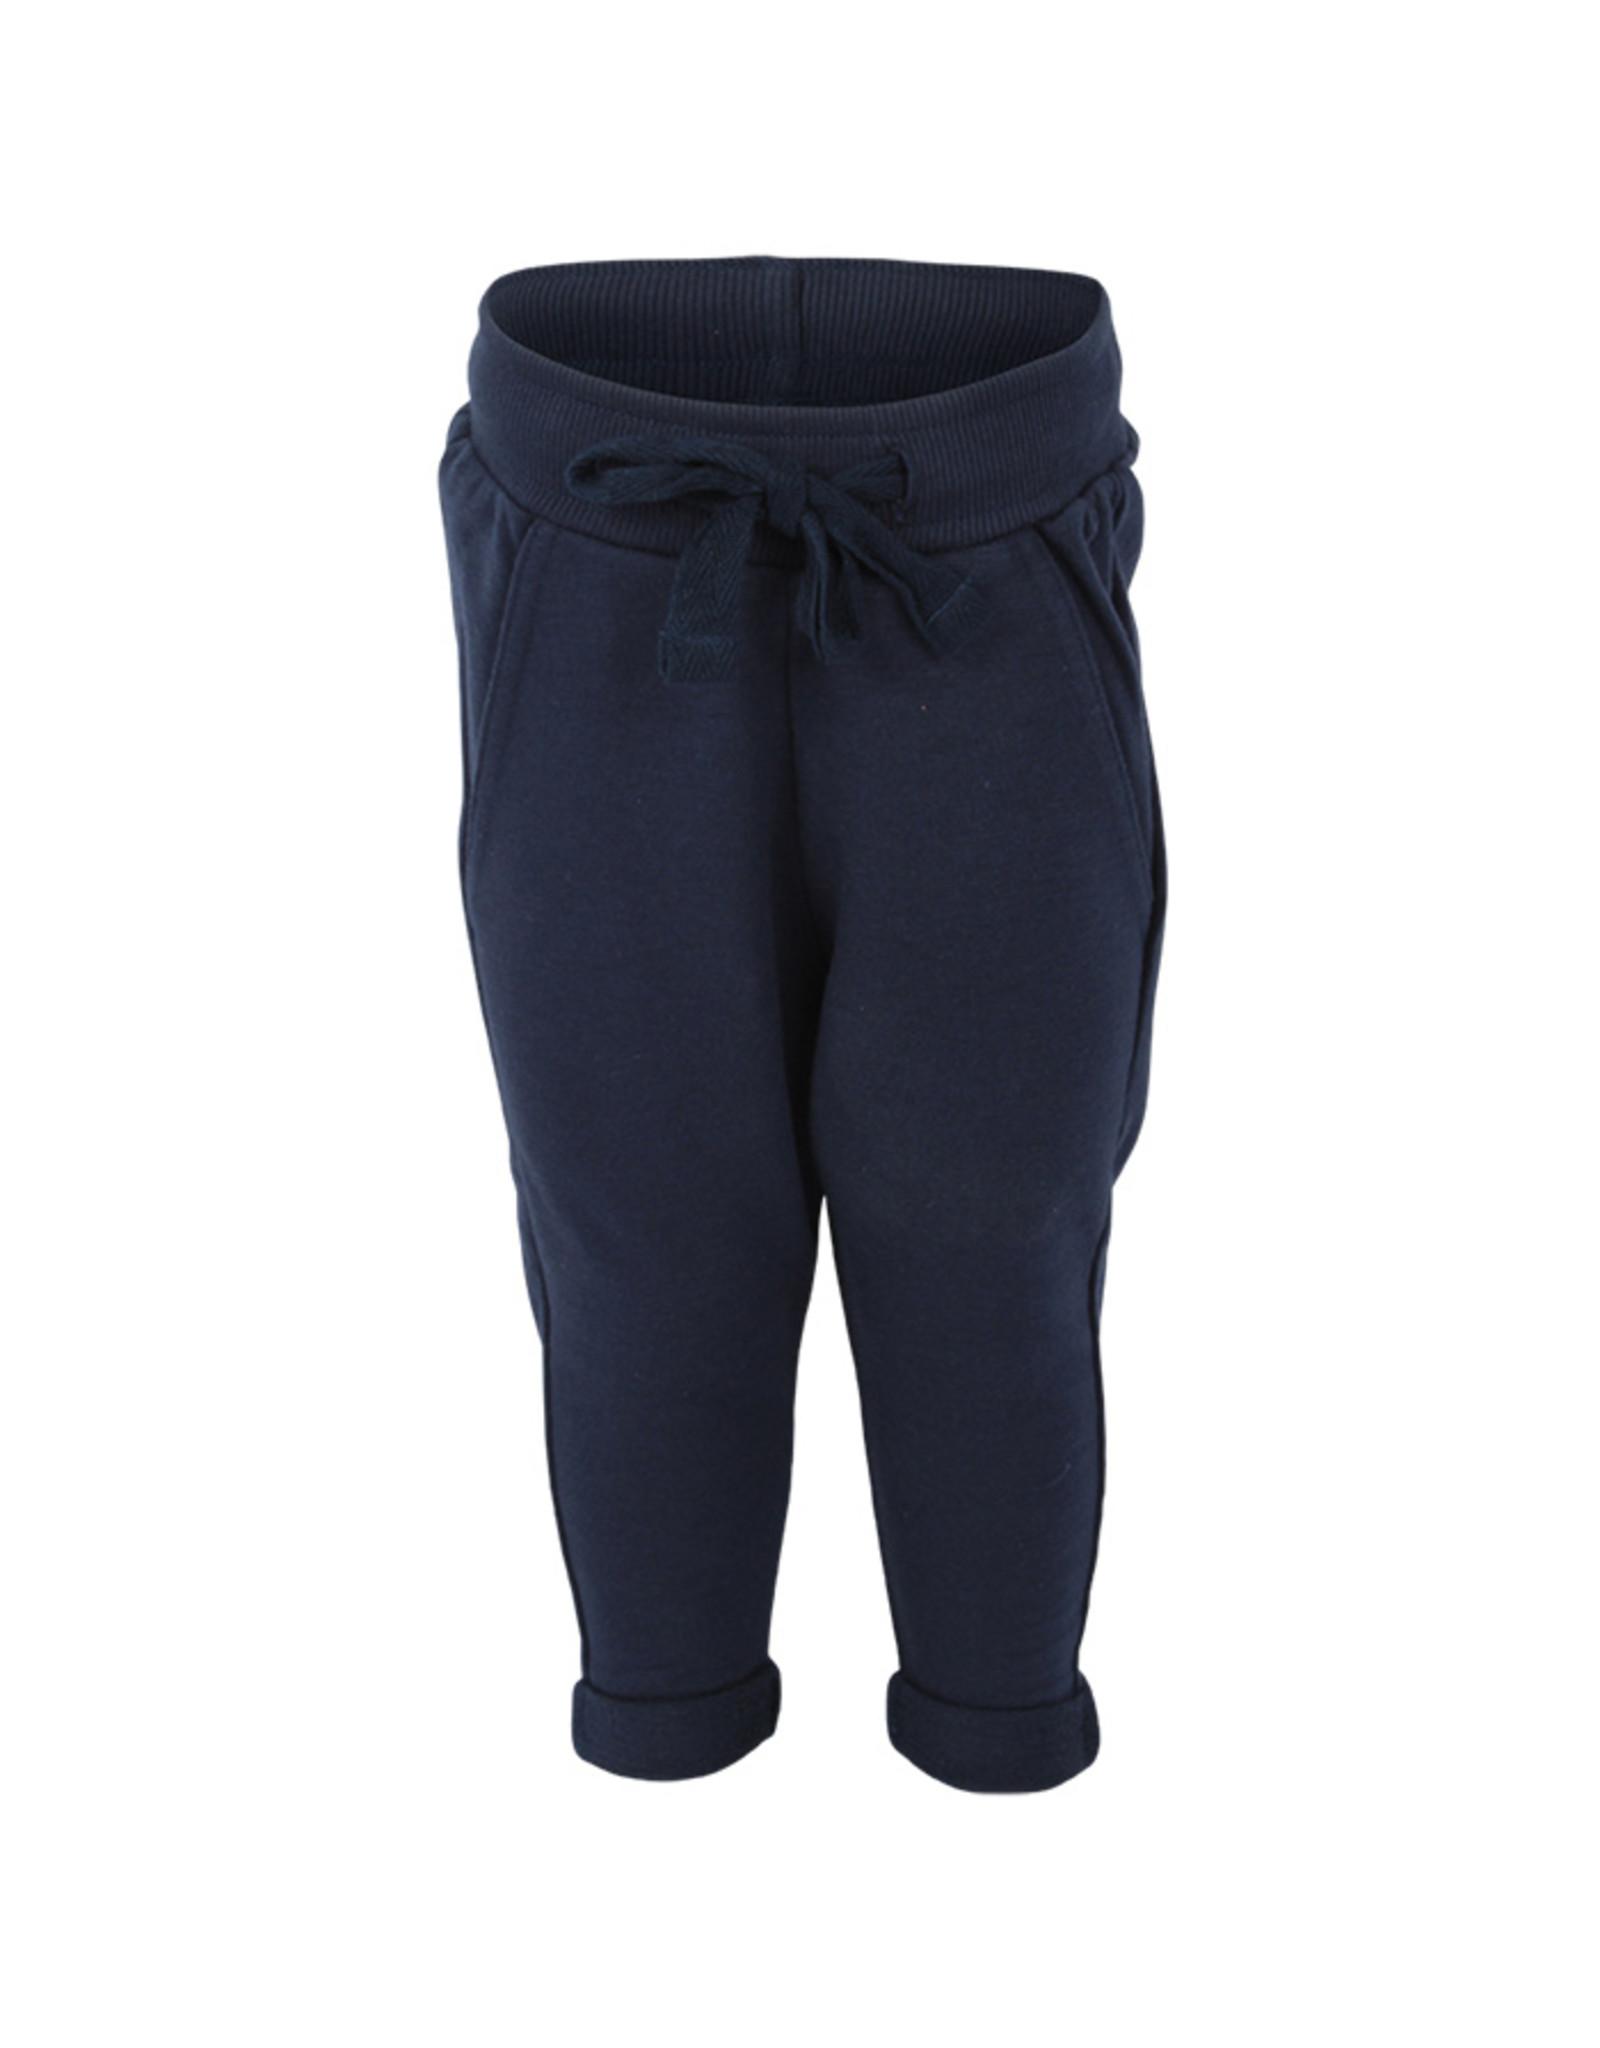 Enfant EN FANT Pants Gots Navy